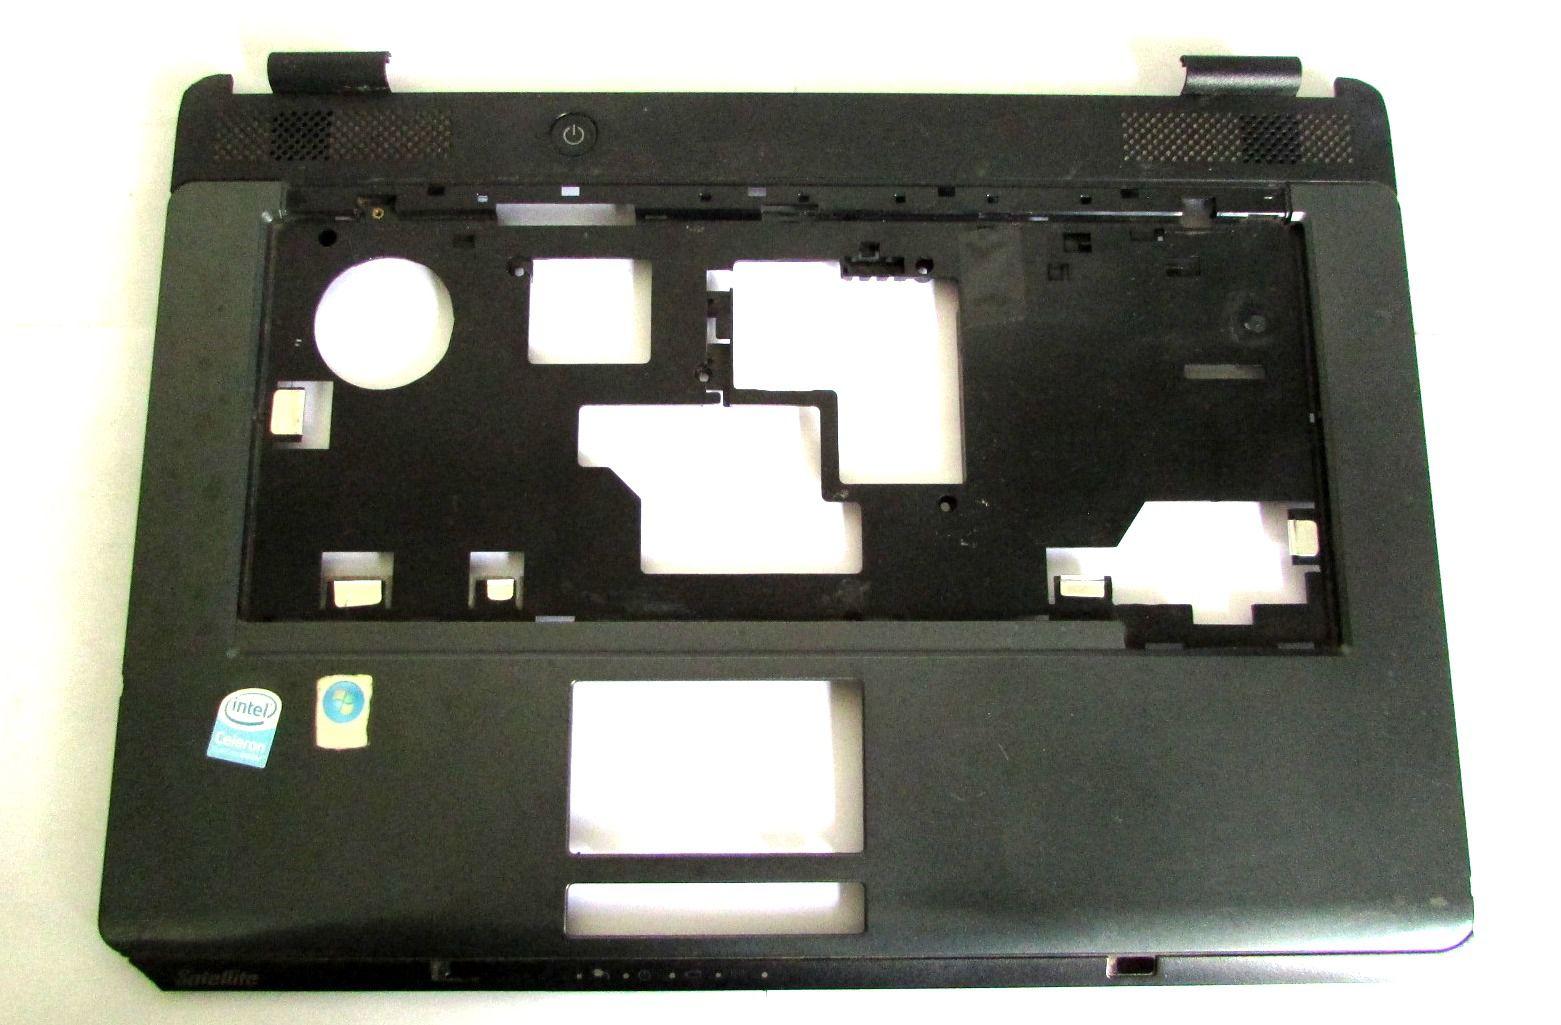 Carcaça Base Teclado Notebook TOSHIBA L300 L300D P/N: 6051b0261405-be (semi novo)